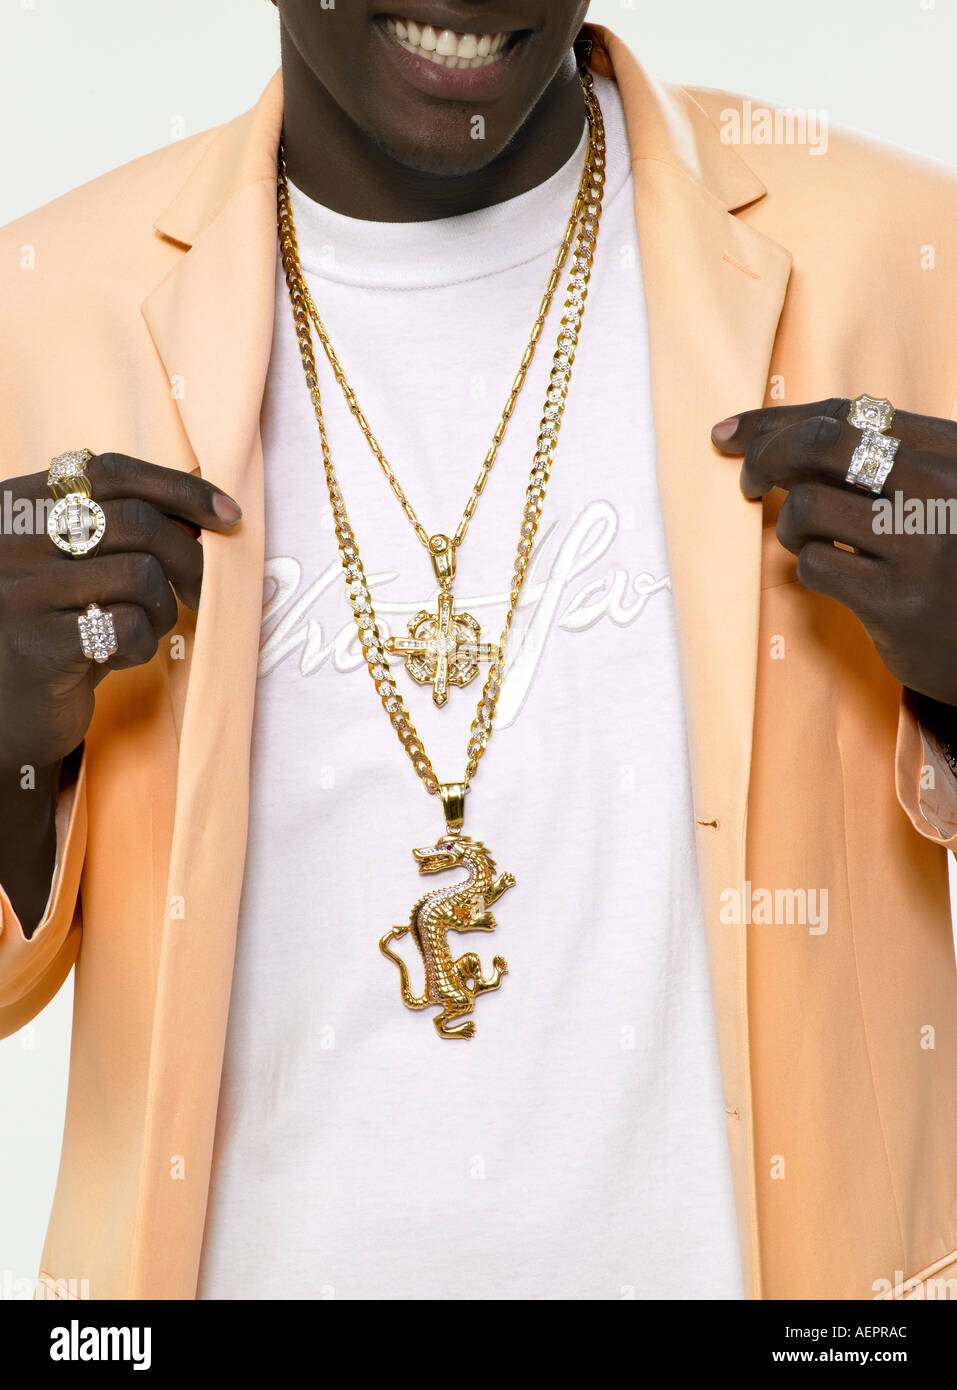 Cofre Bling rap con joyas del artista. Imagen De Stock